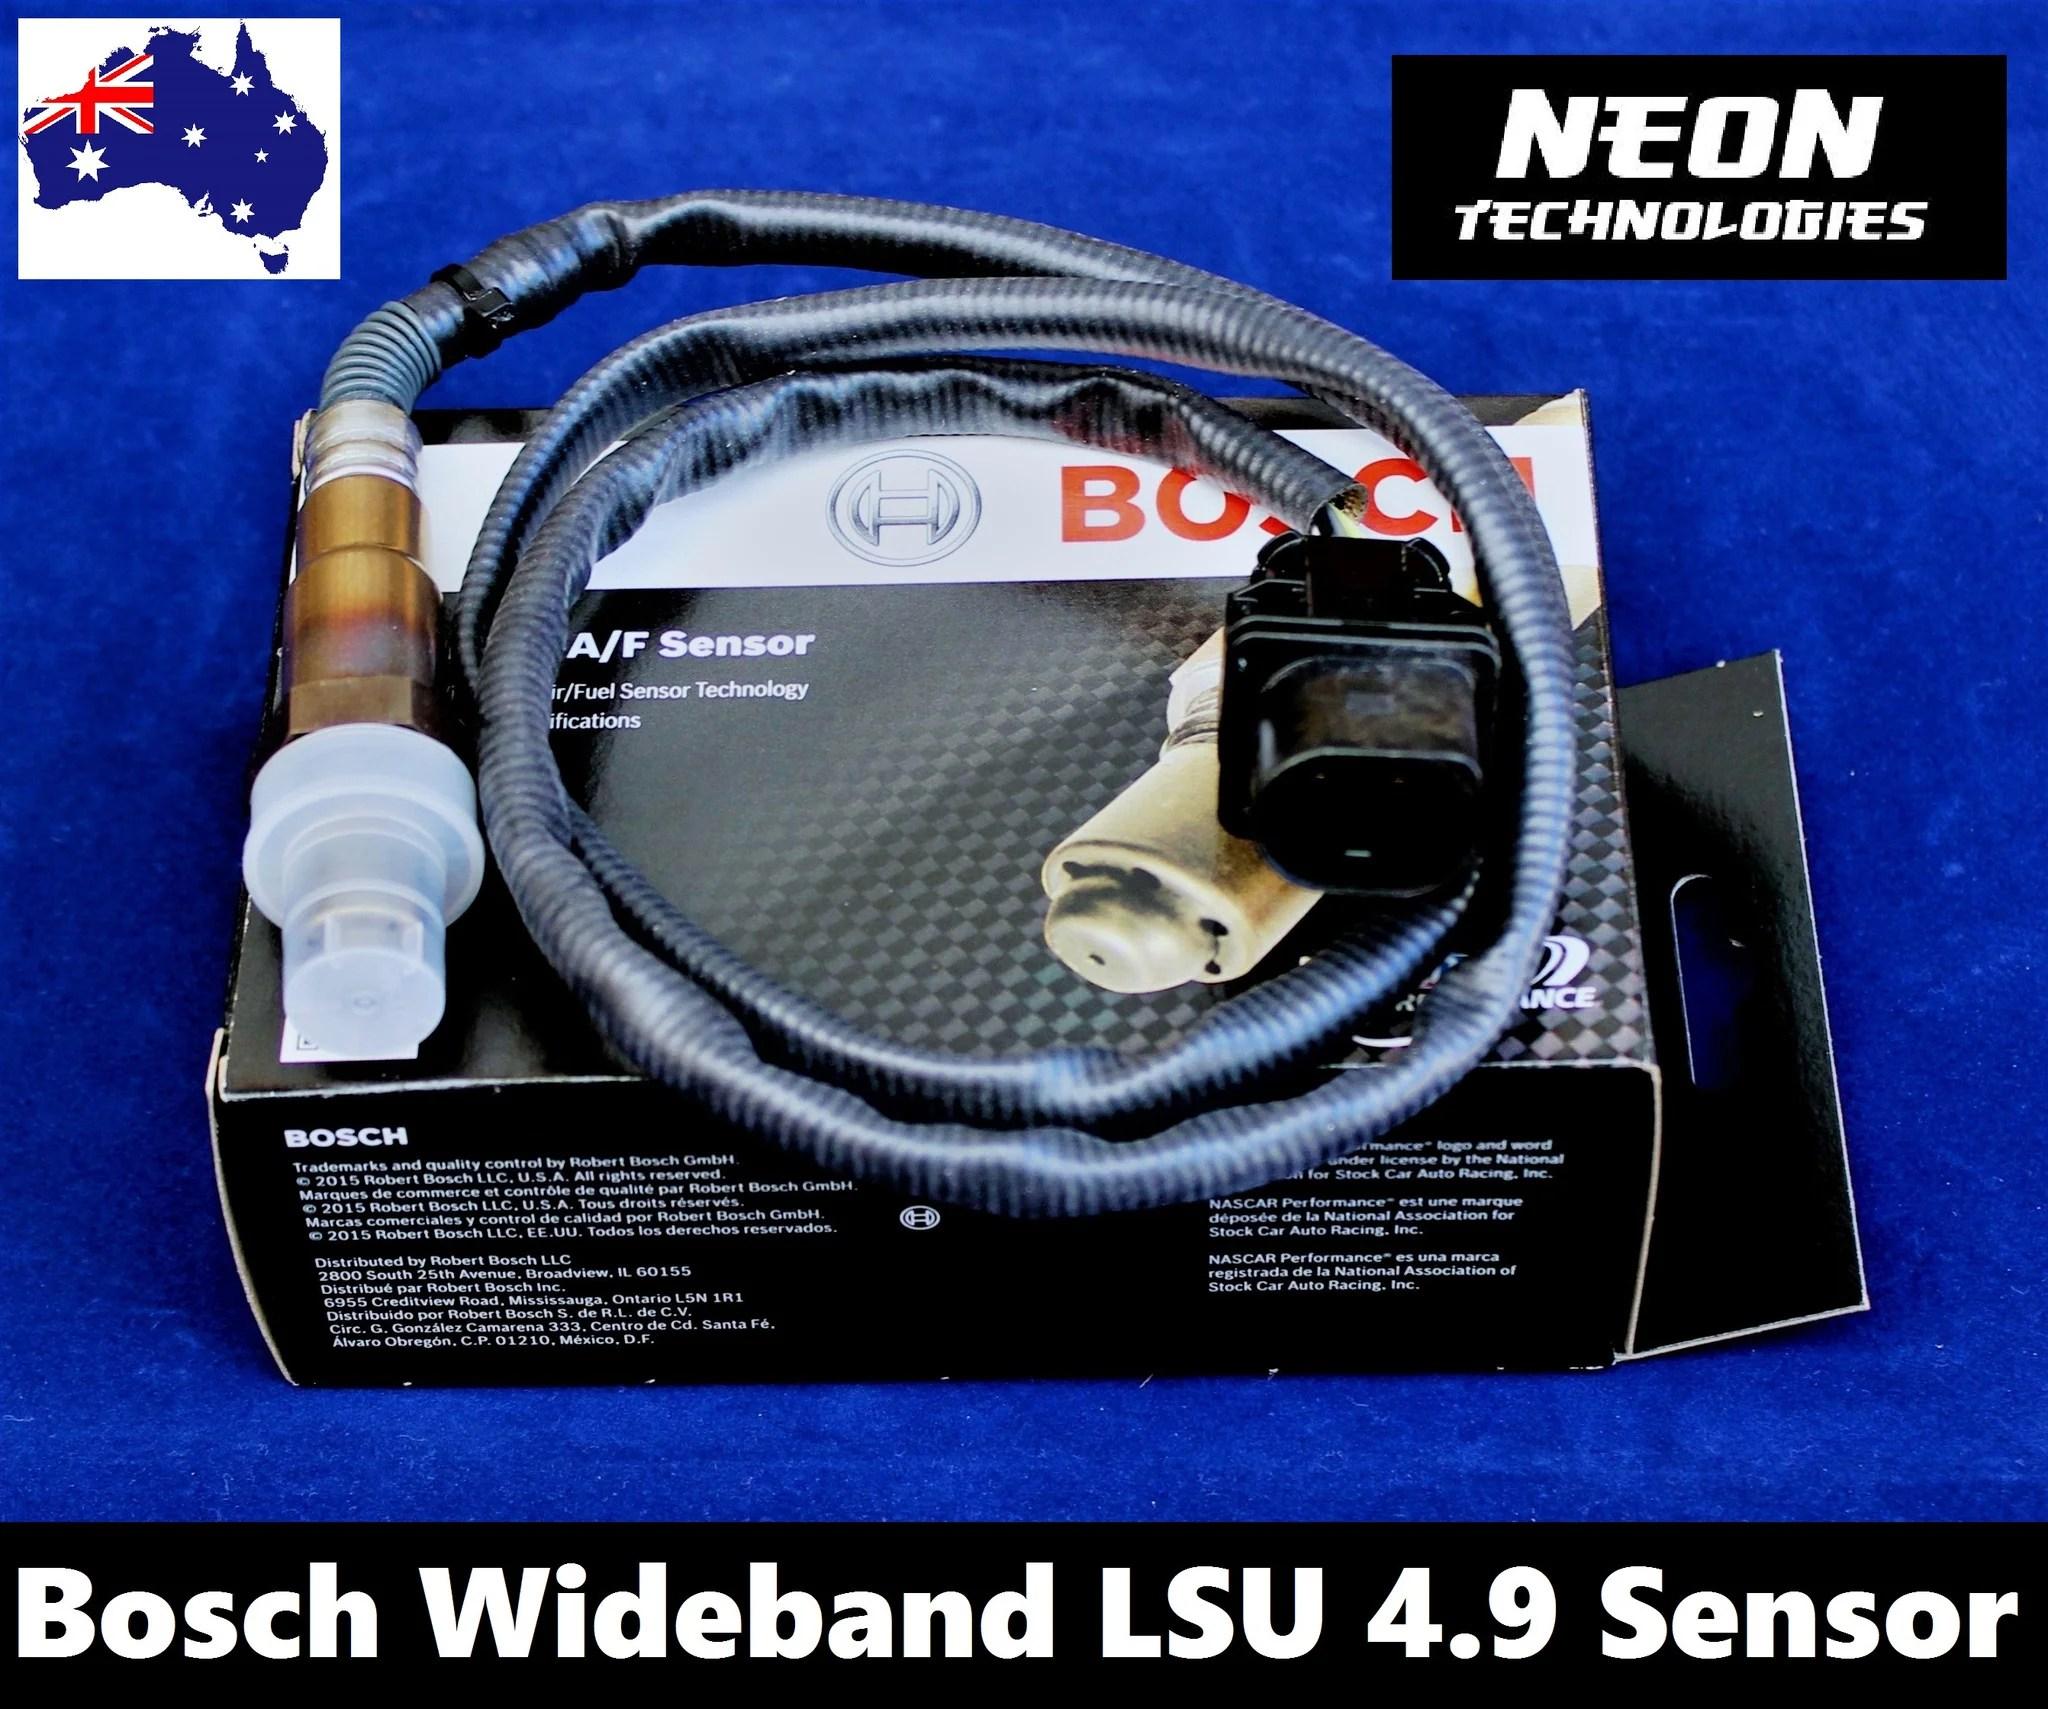 medium resolution of bosch wideband 5 wire lsu 4 9 oxygen sensor bosch lsu4 9 oxygen sensor wideband afr controller sensor wiring